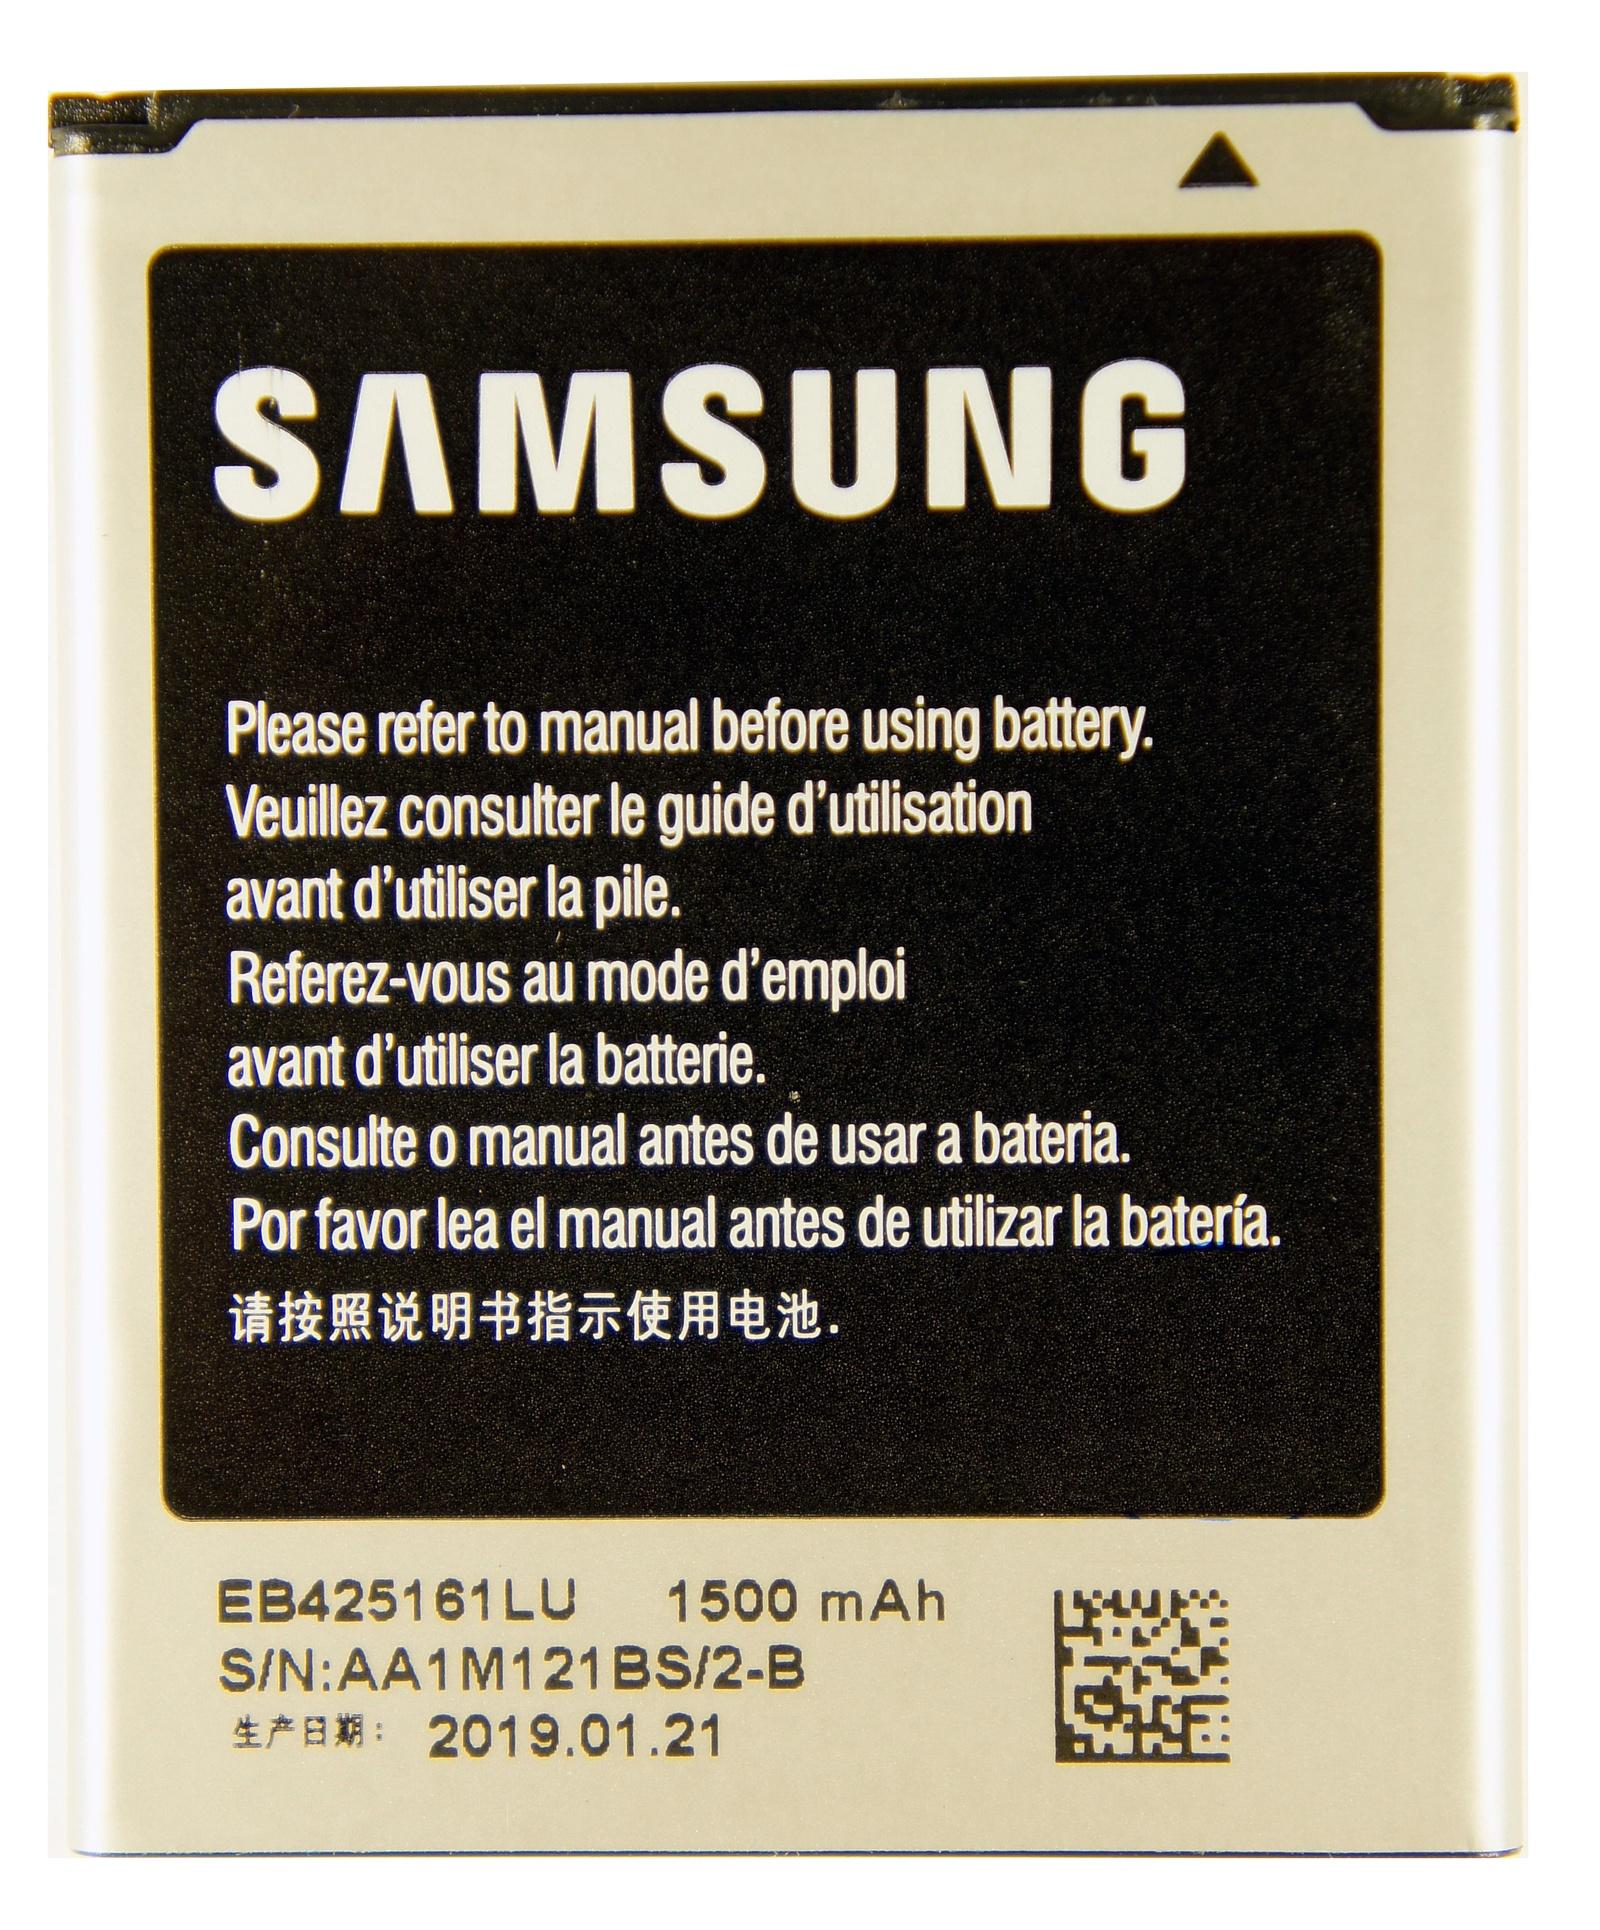 Аккумулятор для Samsung EB-F1M7FLU, EB425161LA, EB425161LU стоимость